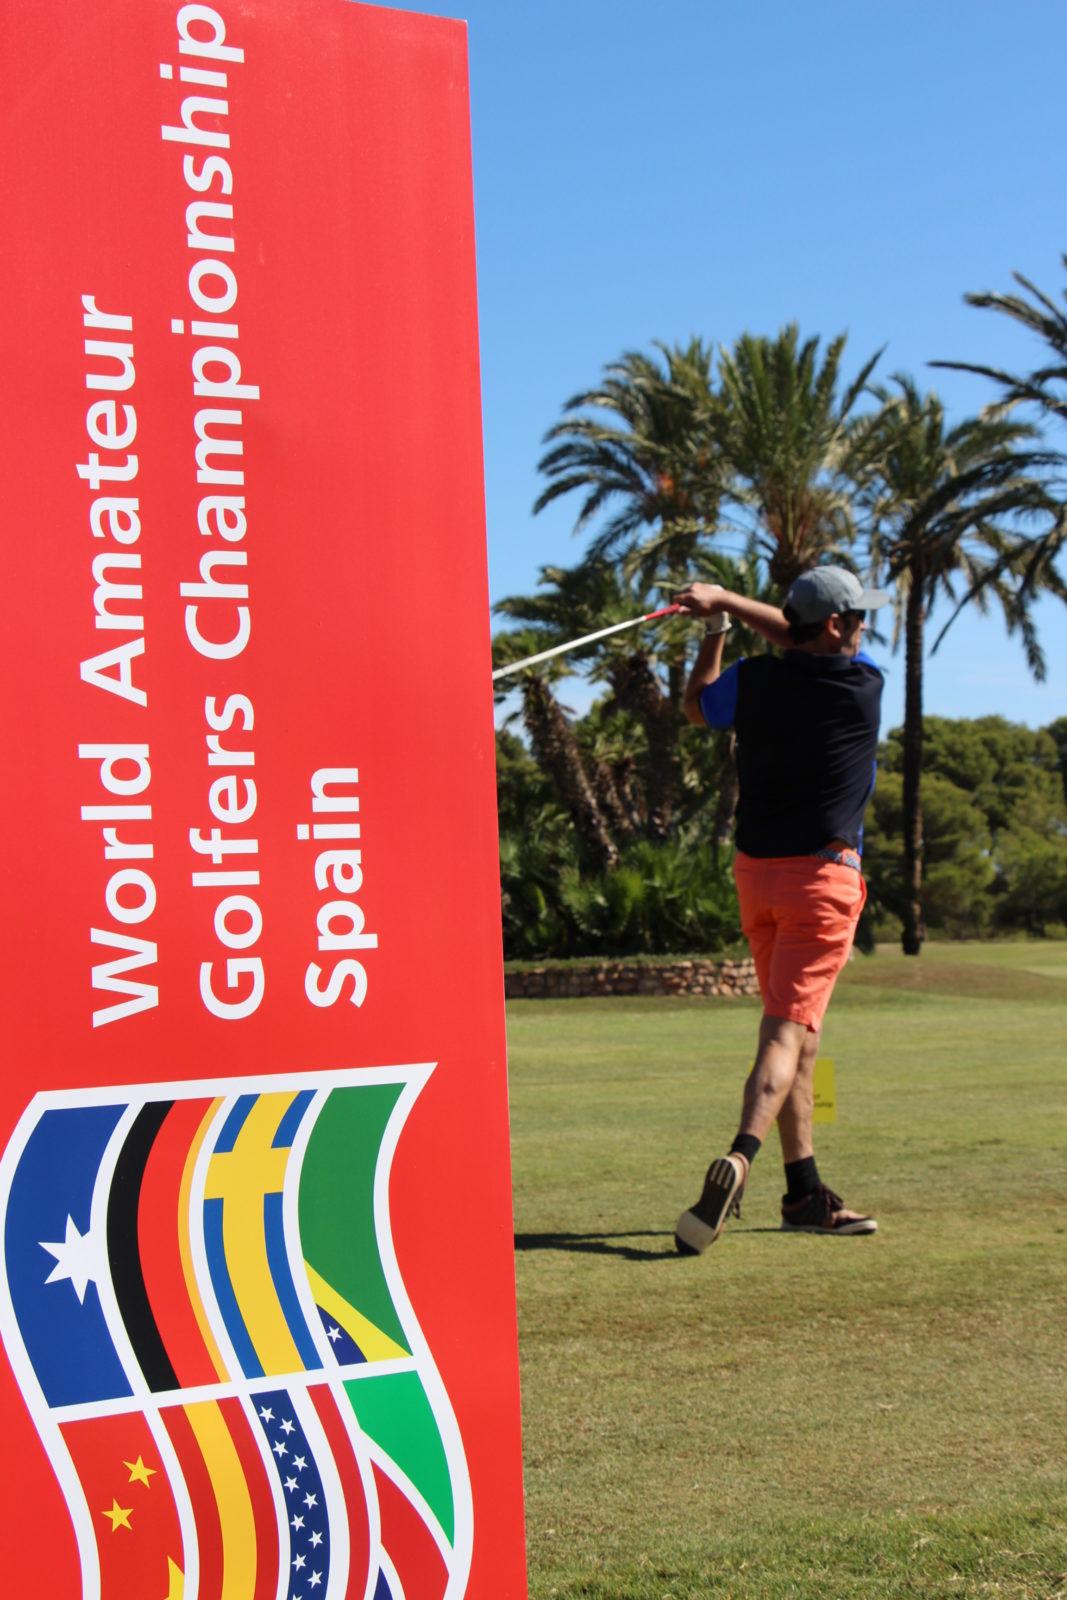 La Manga Club acoge la Final Nacional del Campeonato del Mundo de Golf Amateur